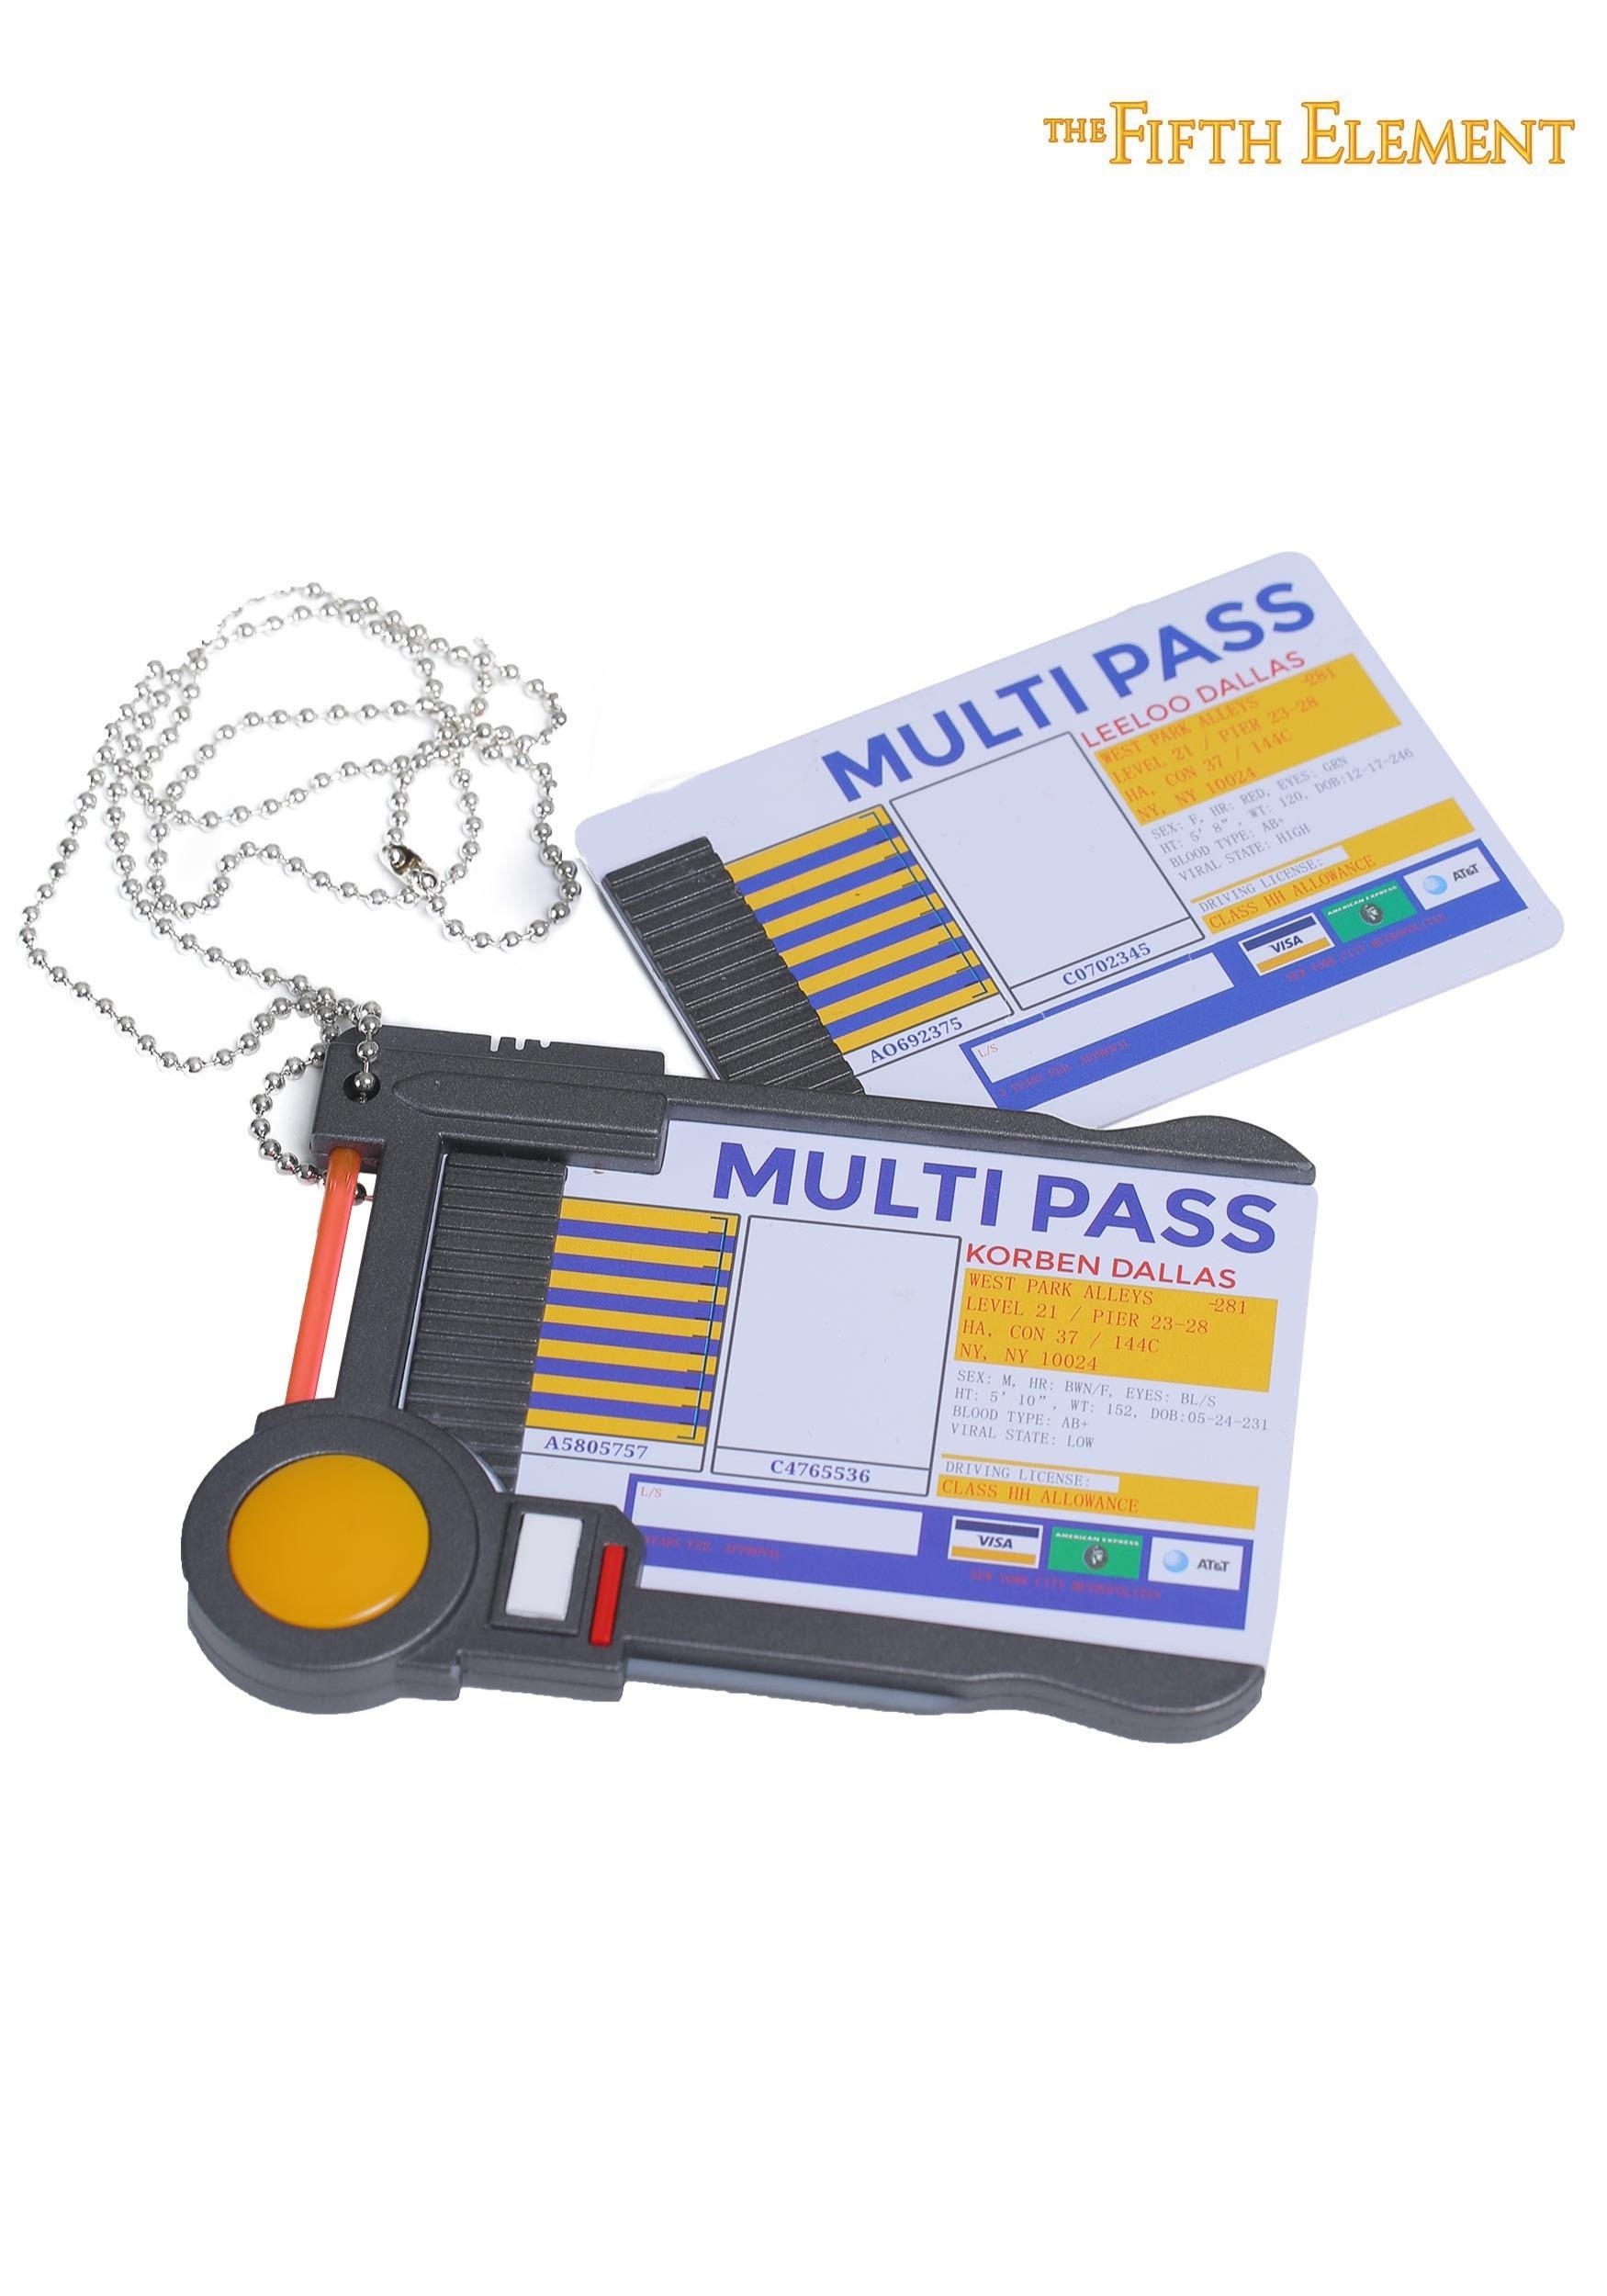 Nerd Block The Fifth Element Multi Pass Prop Replica Collectible Props &  Memorabilia Toys & Games